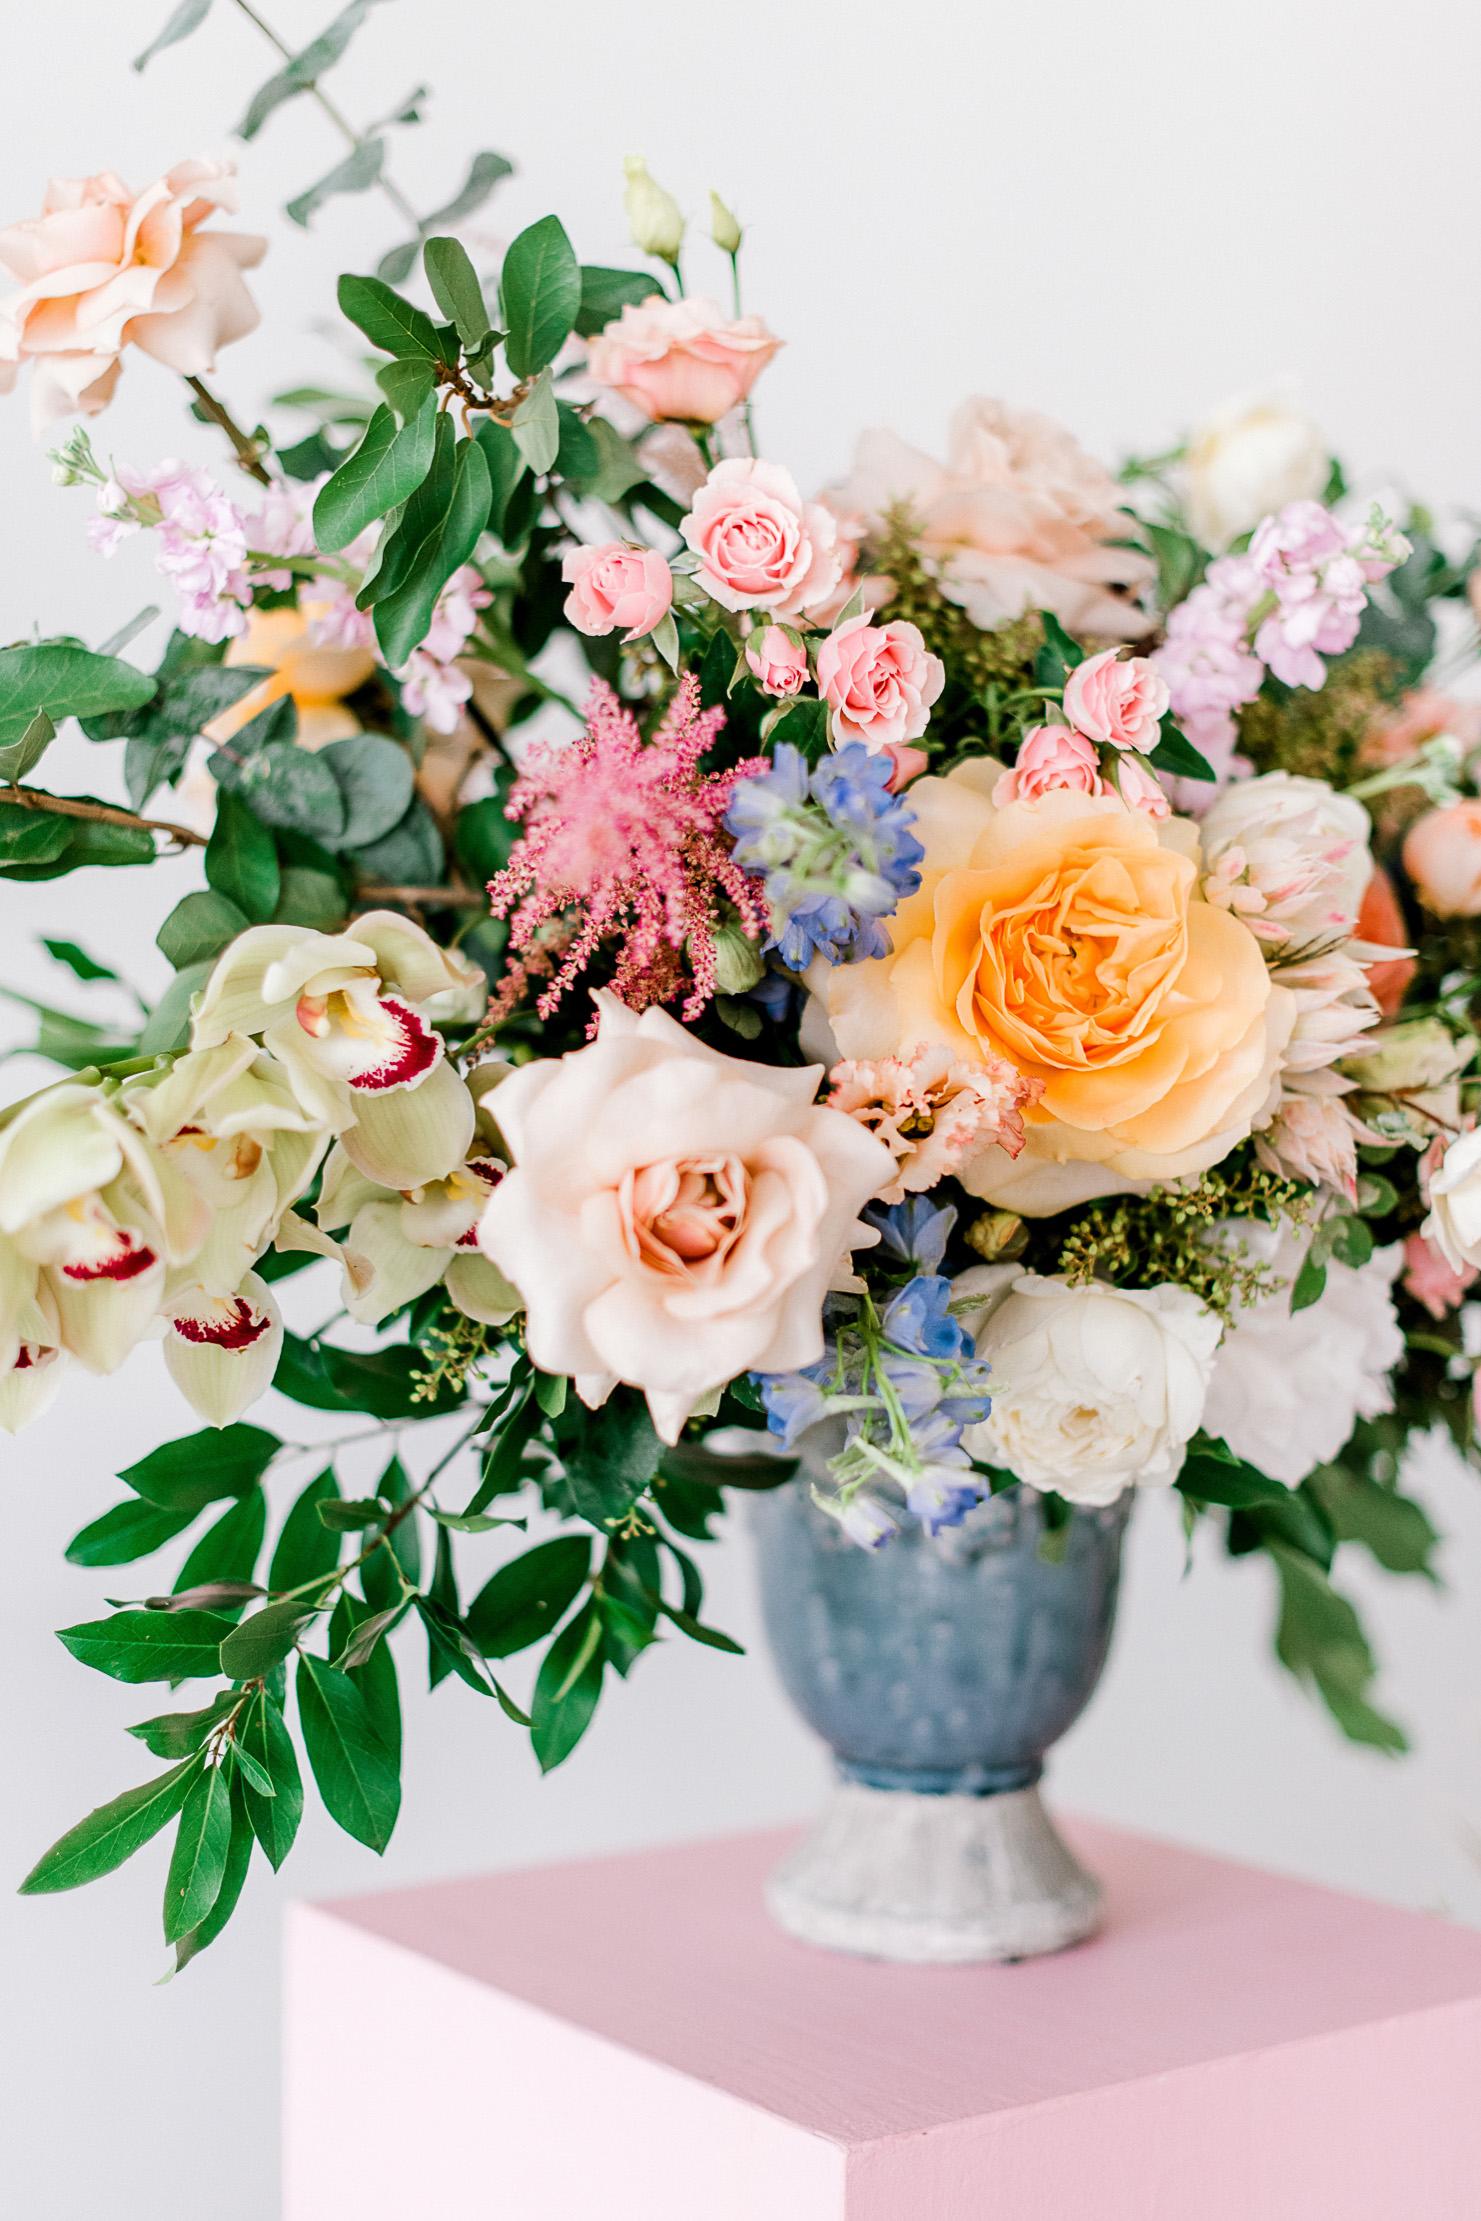 Houston-Wedding-Photographer-Editorial-Fine-Art-Film-Destination-Dallas-Texas-Mibellarosa-Josh-Dana-Fernandez-Photography-222.jpg